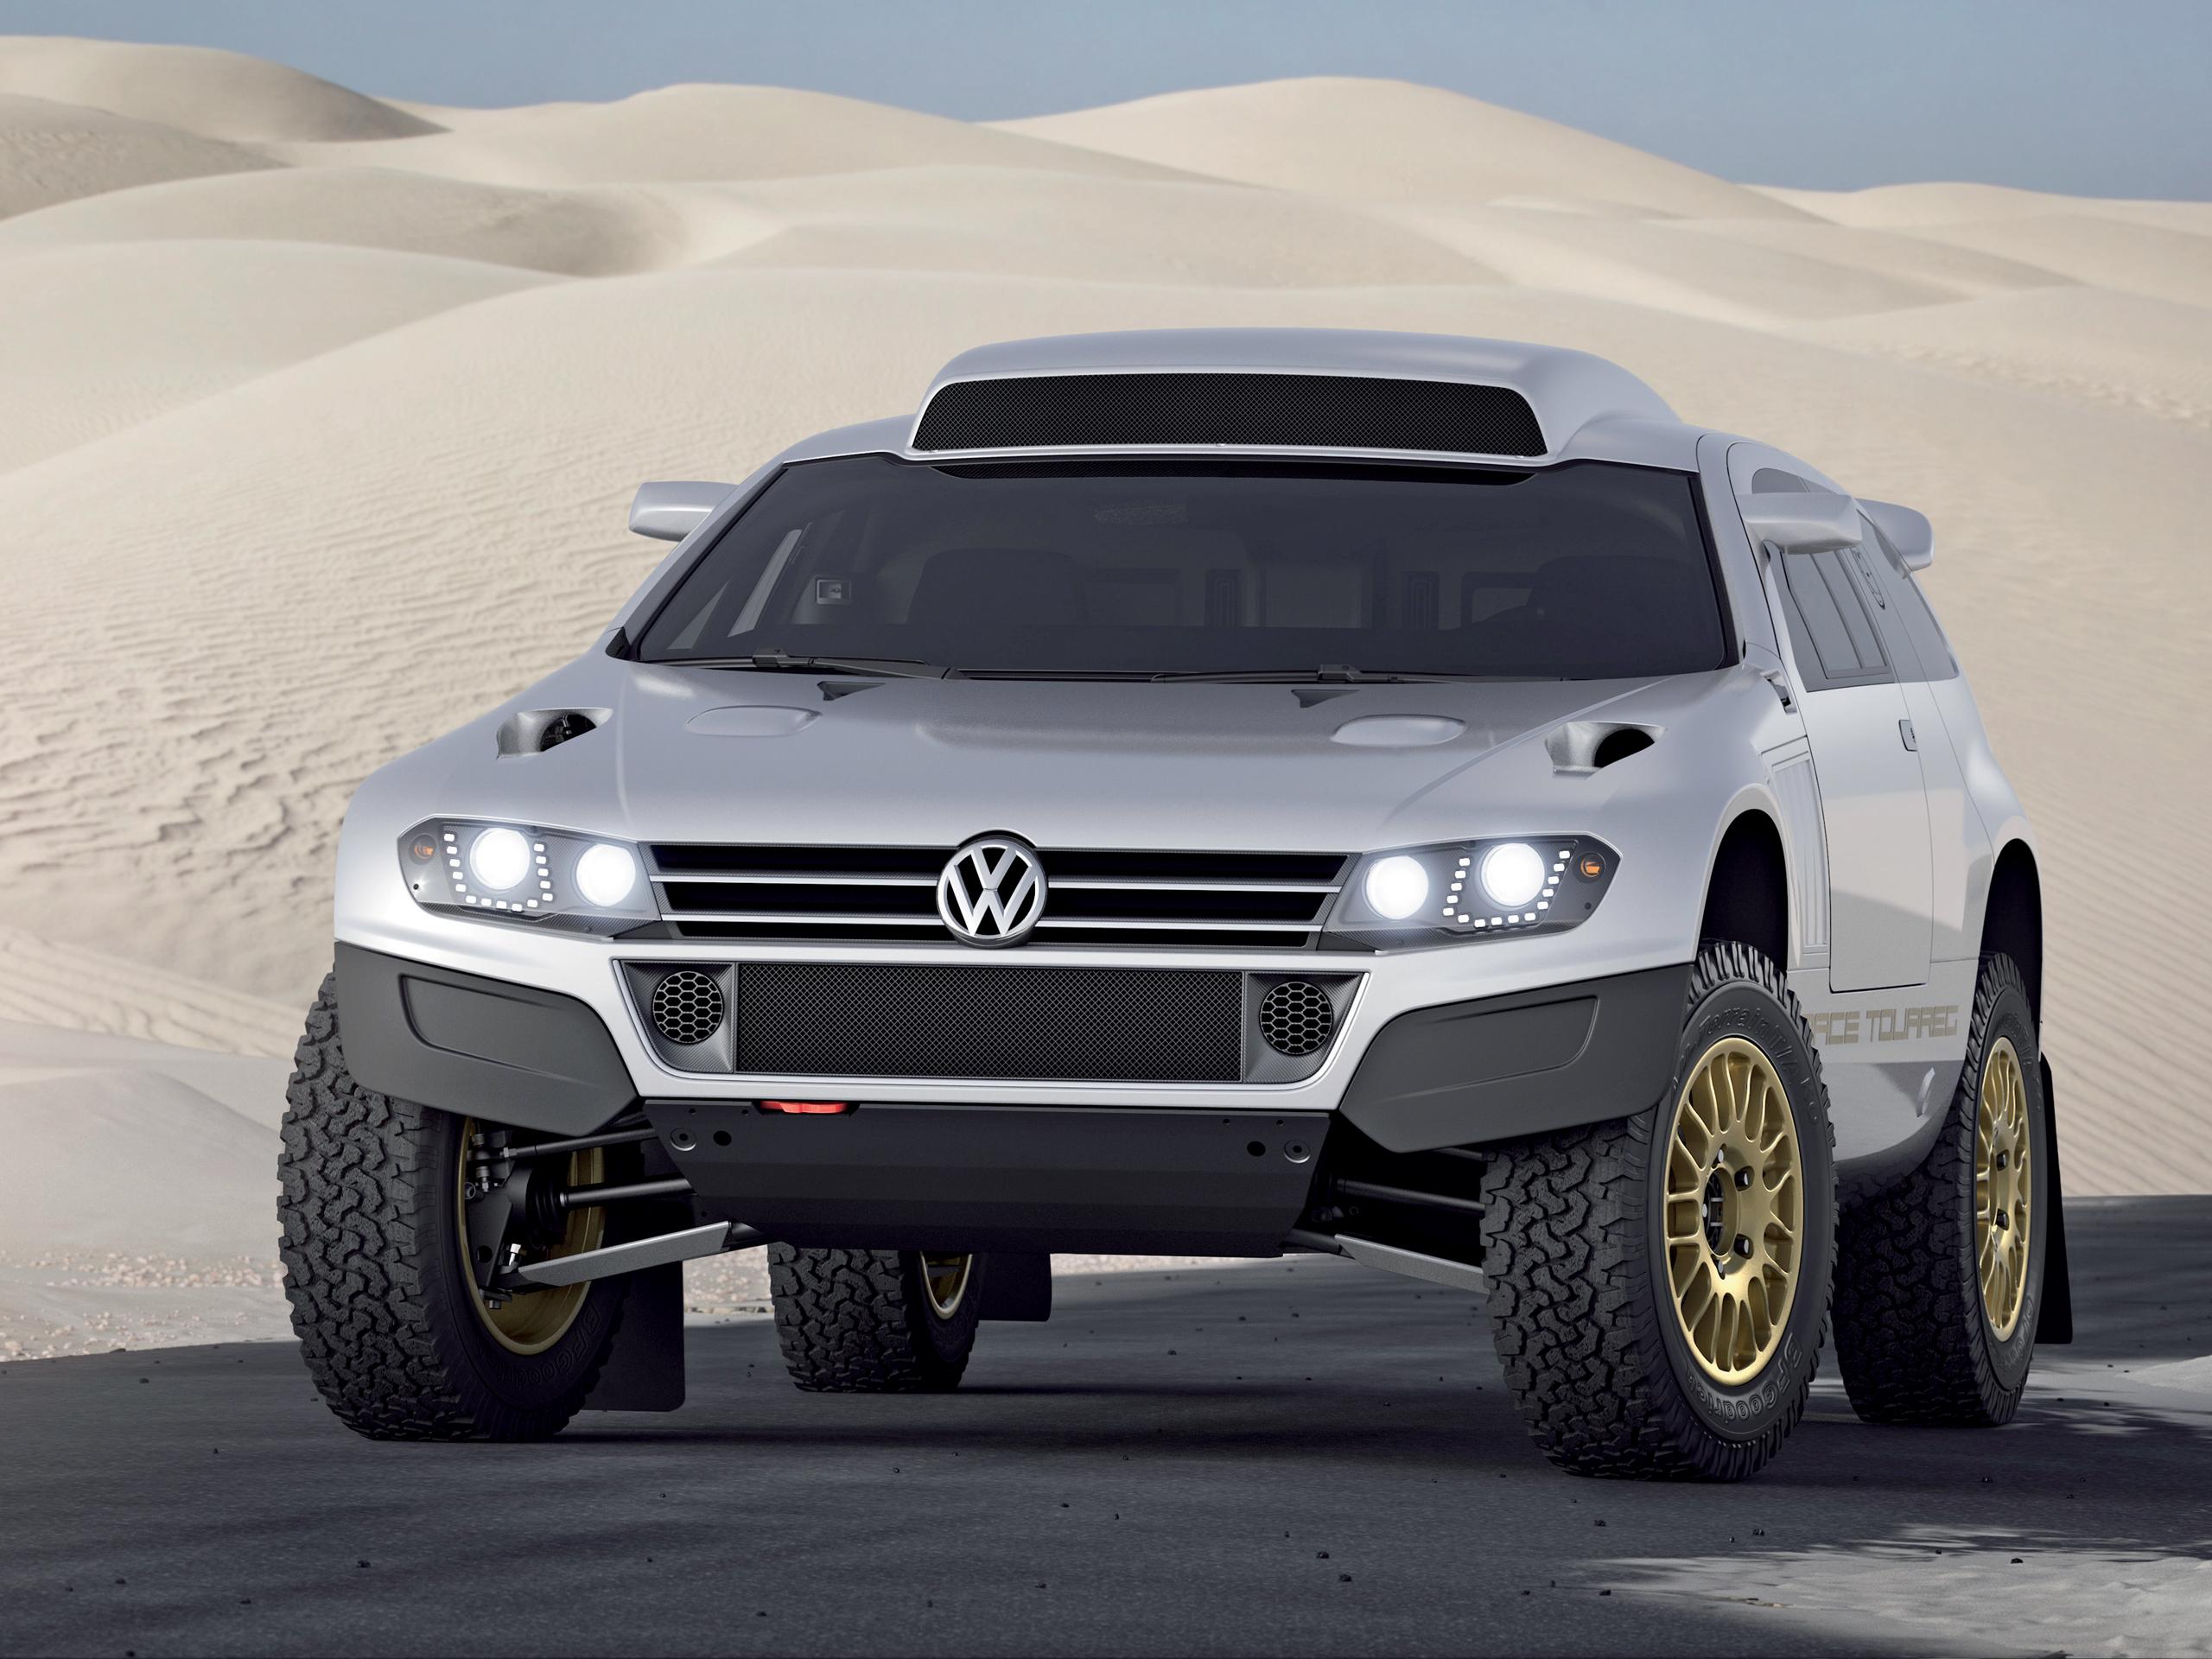 Volkswagen Studie Race Touareg 3 Qatar